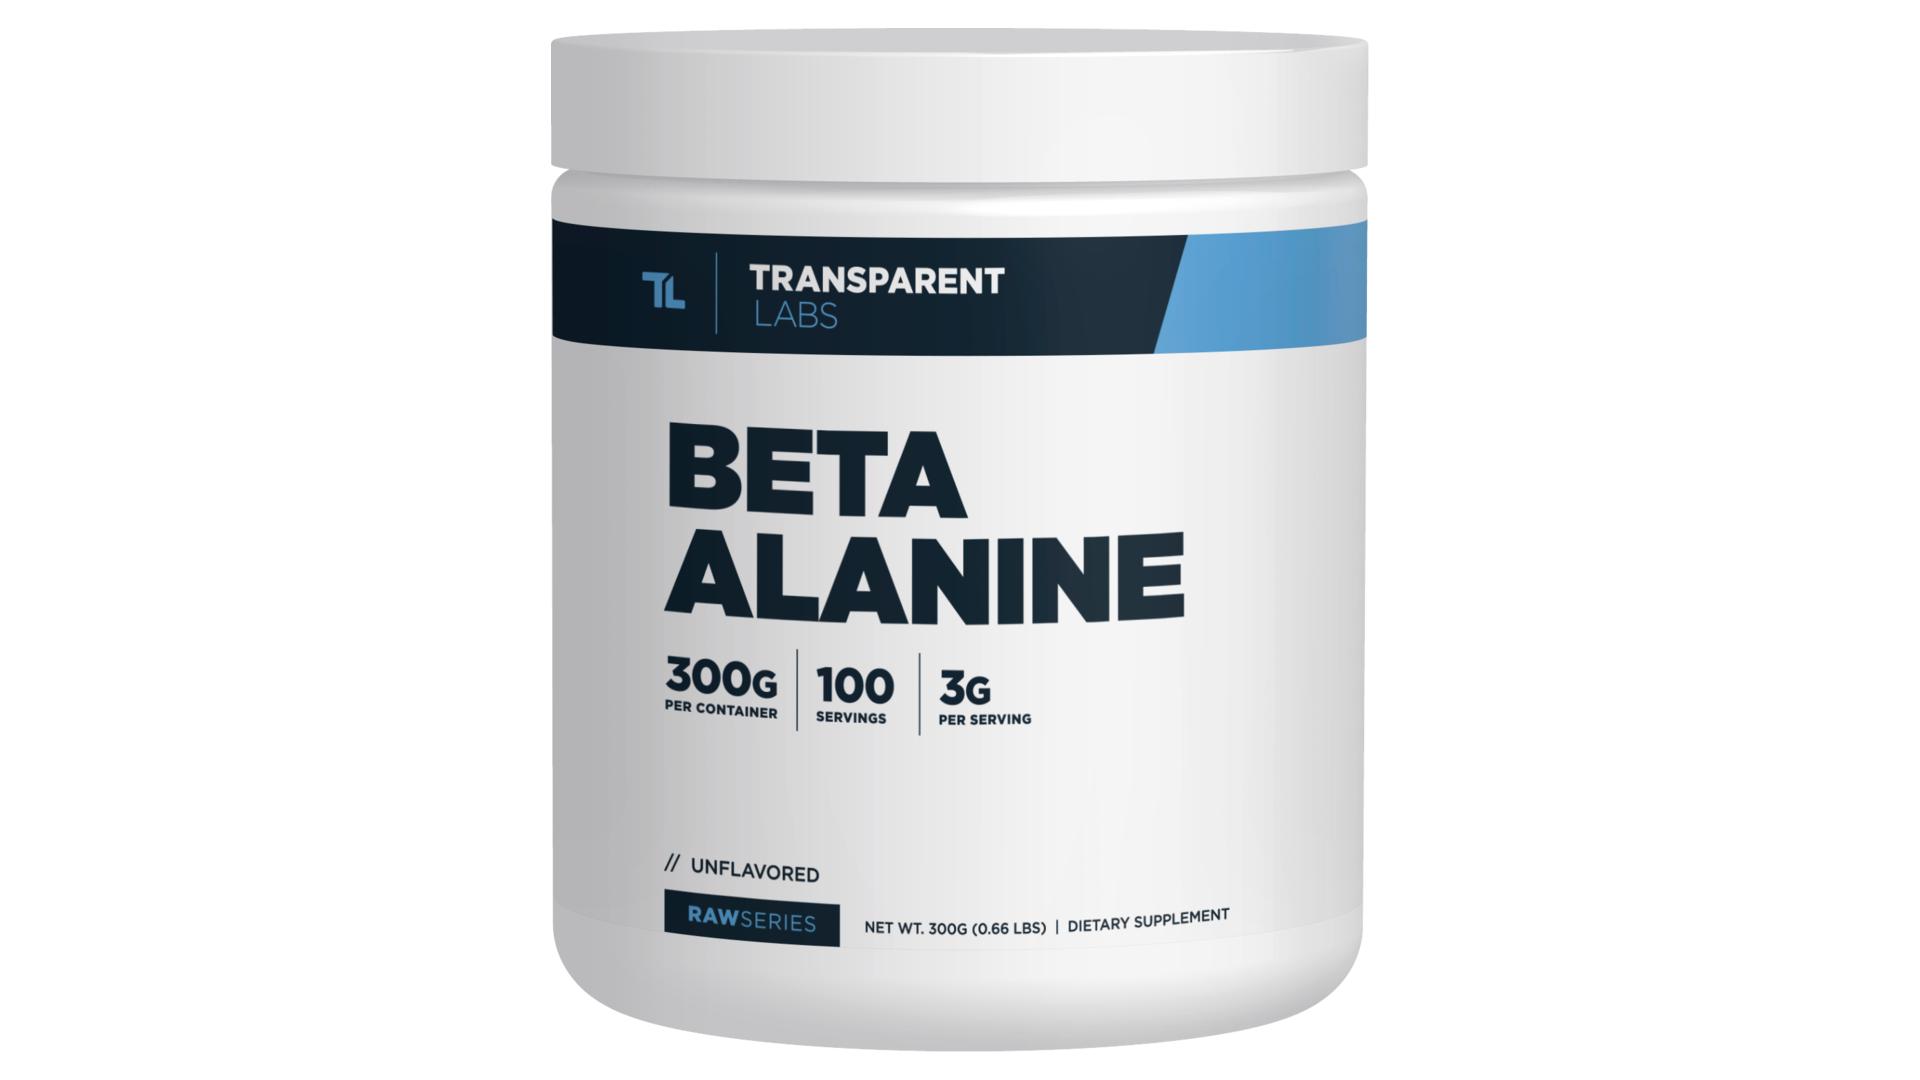 Transparent Labs RawSeries Beta-Alanine